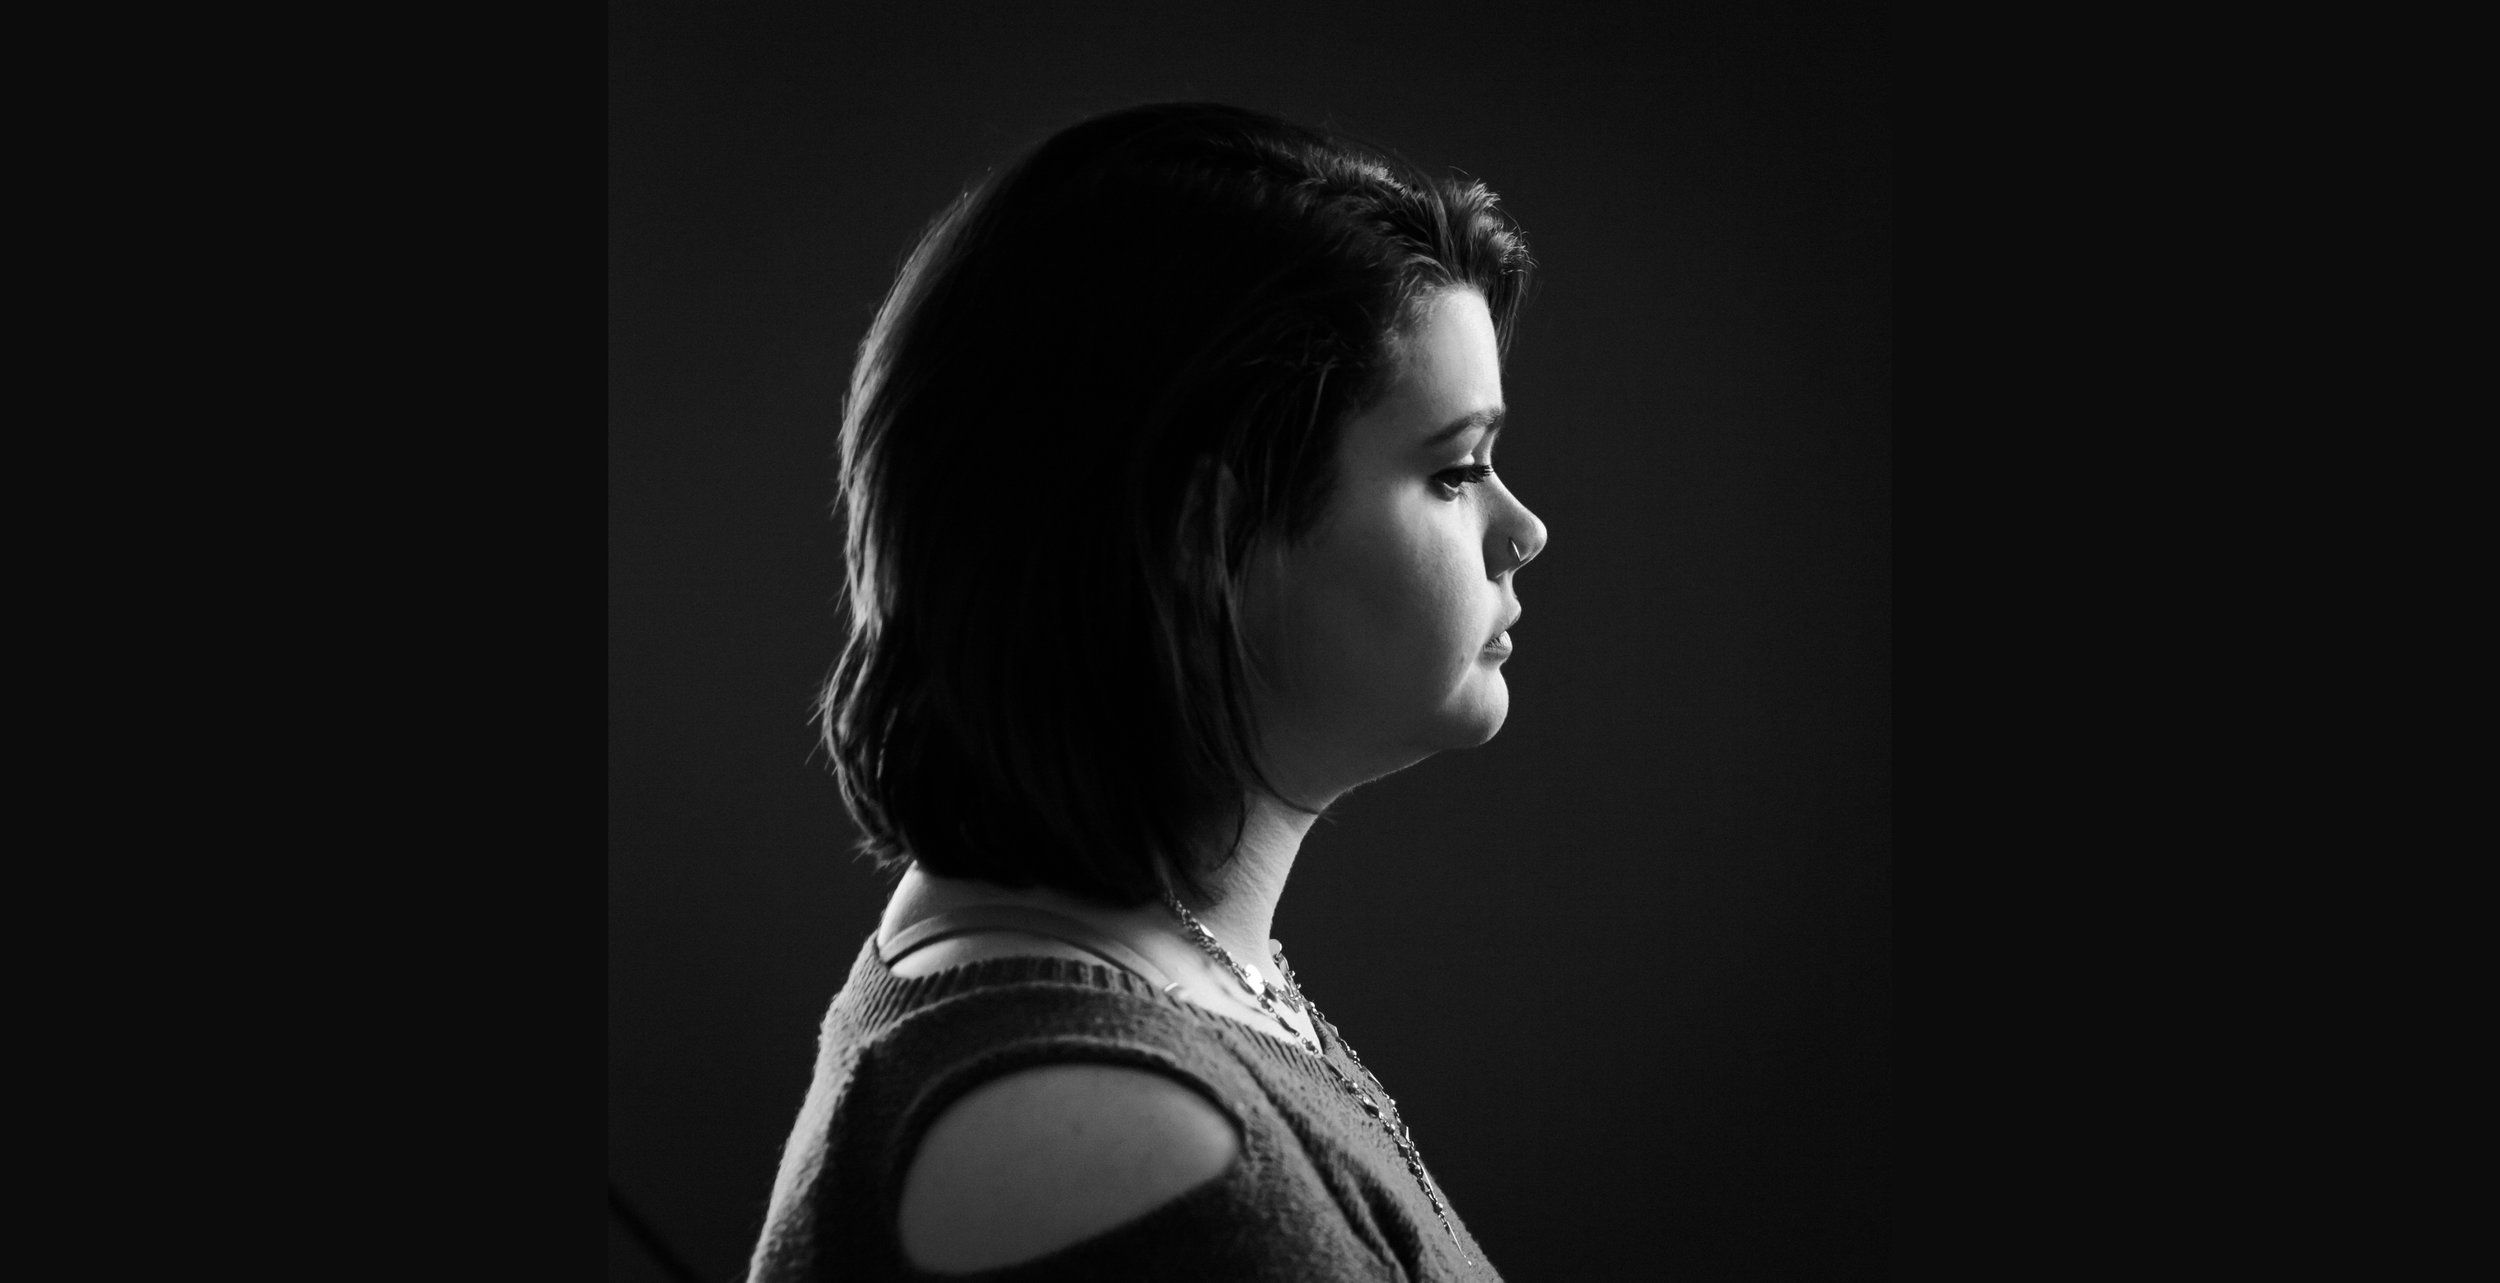 Portrait Photography - Headshots, Branding, Family, & Beyond